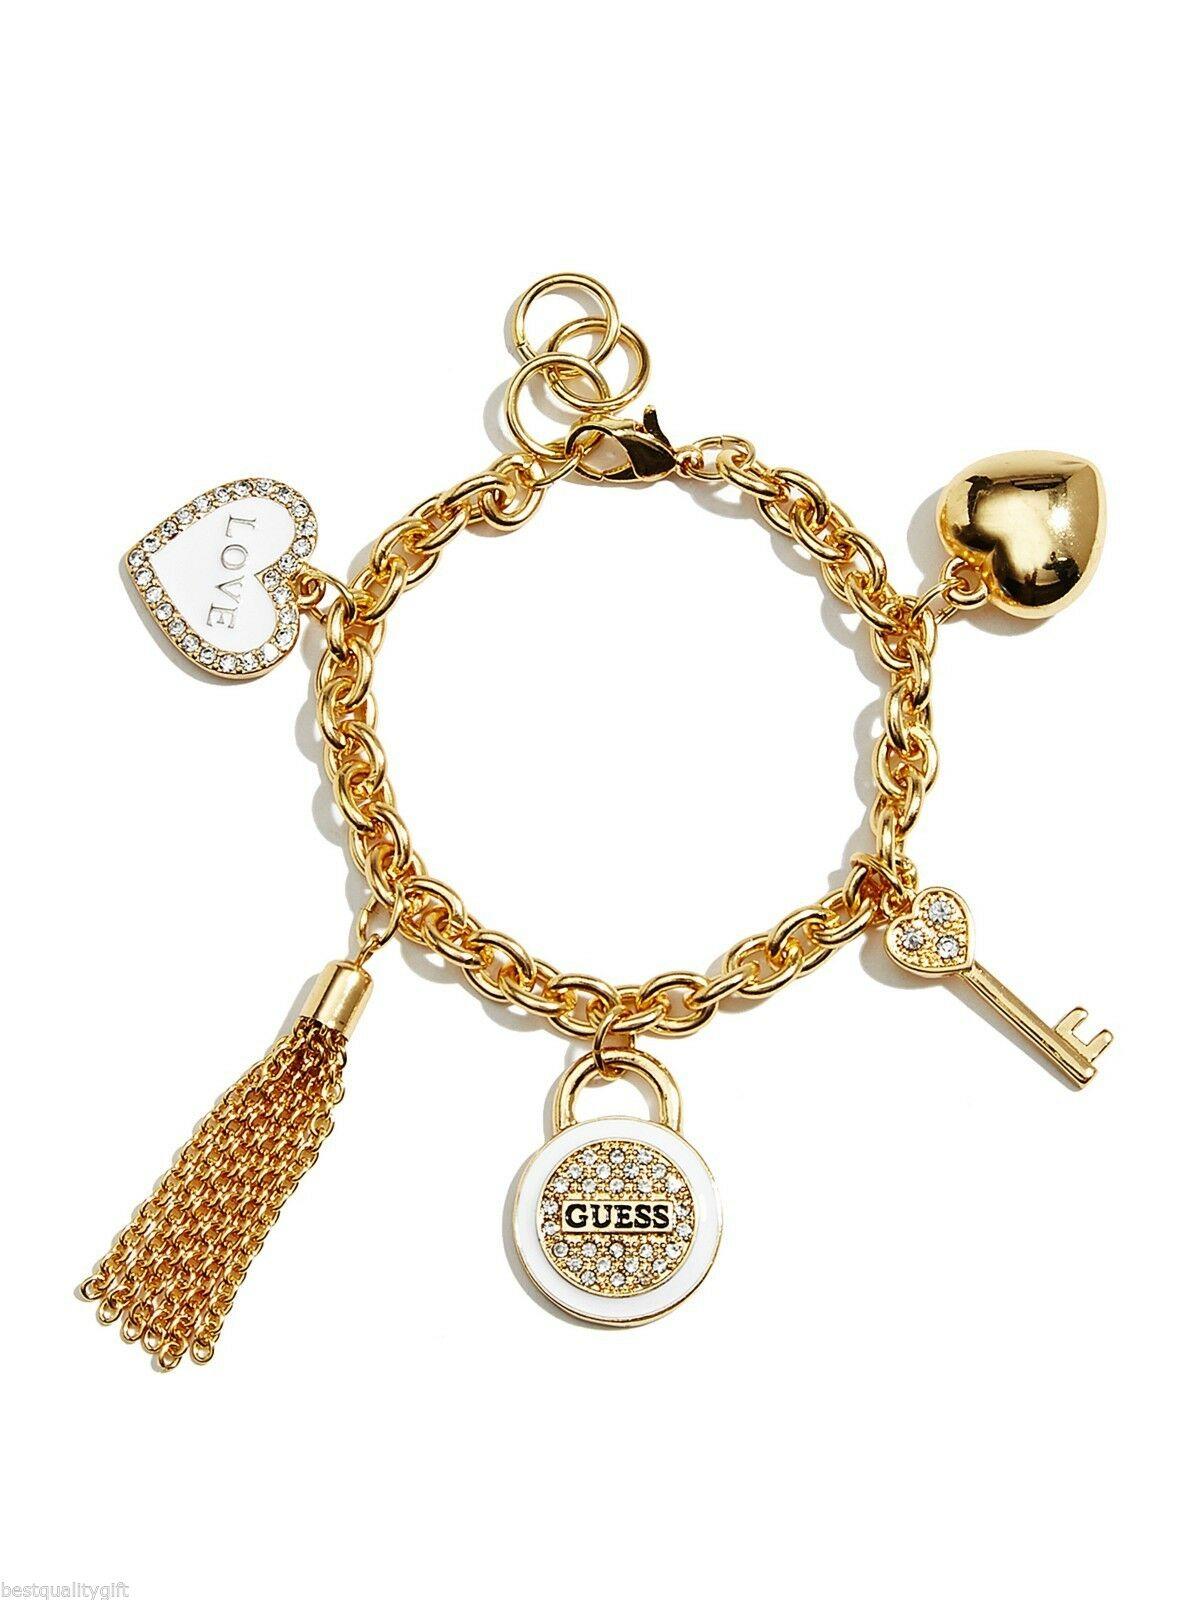 Guess盖尔斯白色金色链条铰链心形钥匙流苏水晶手镯